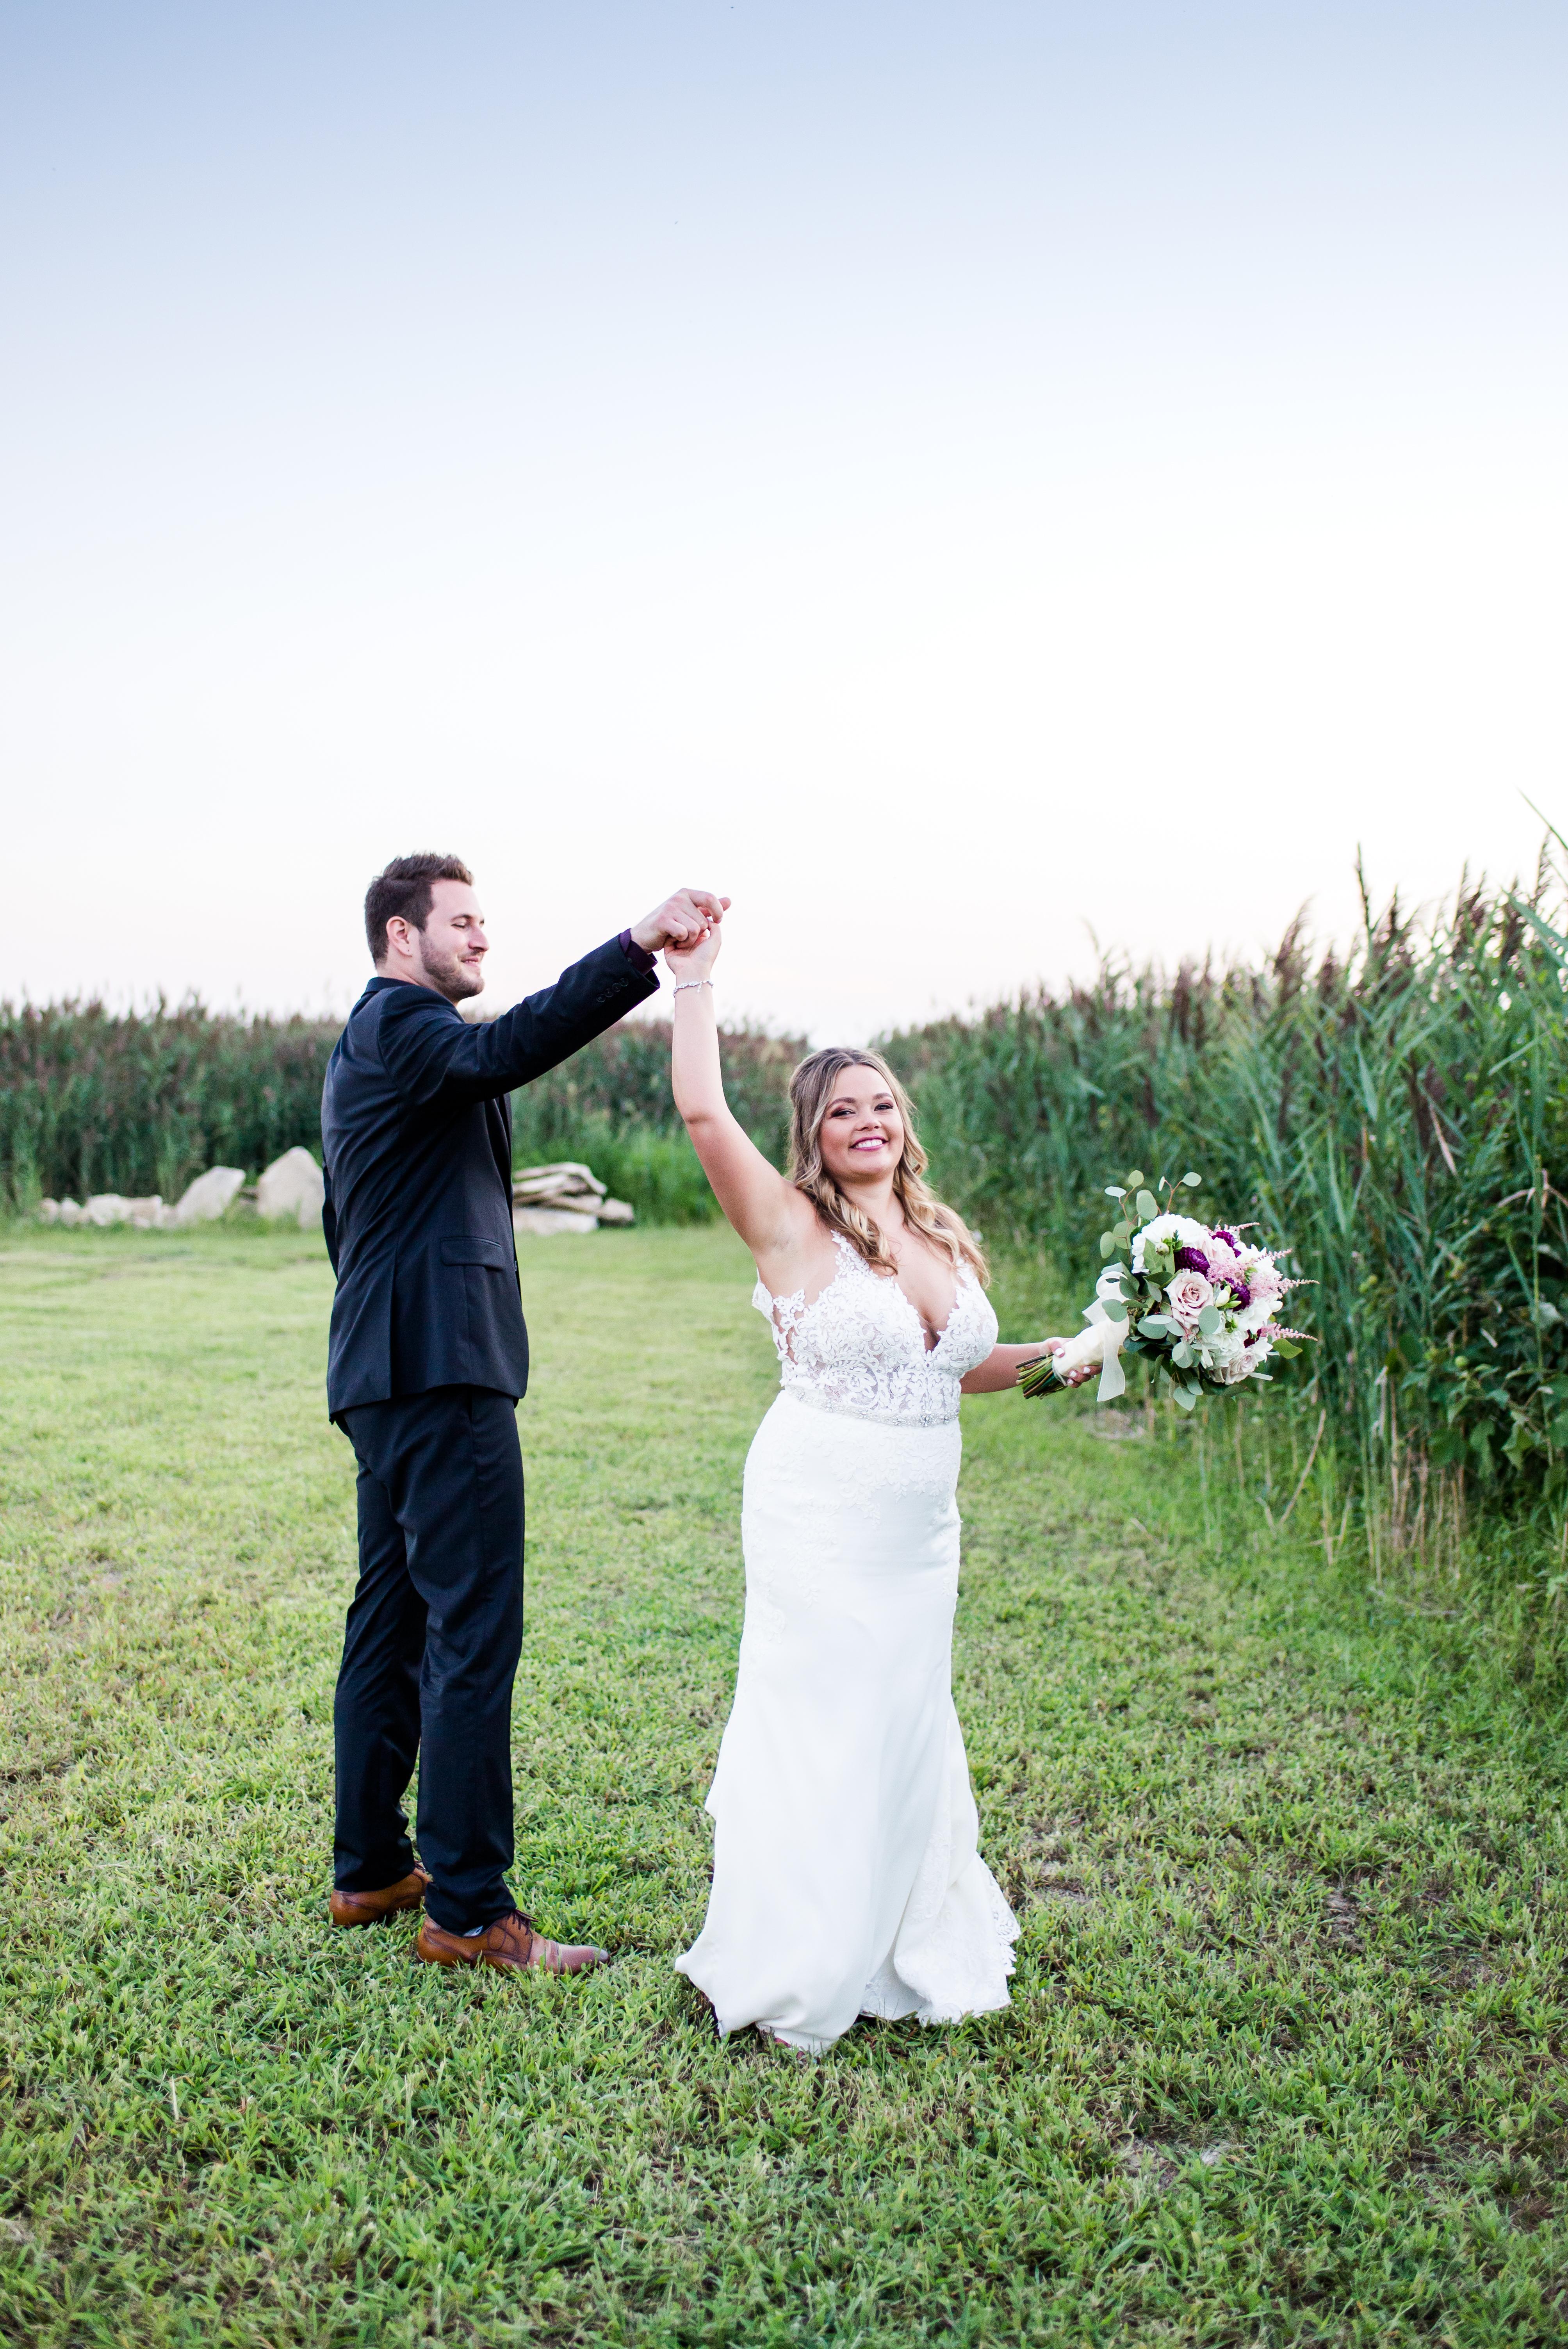 reception-thousand-acre-barn-wedding-and